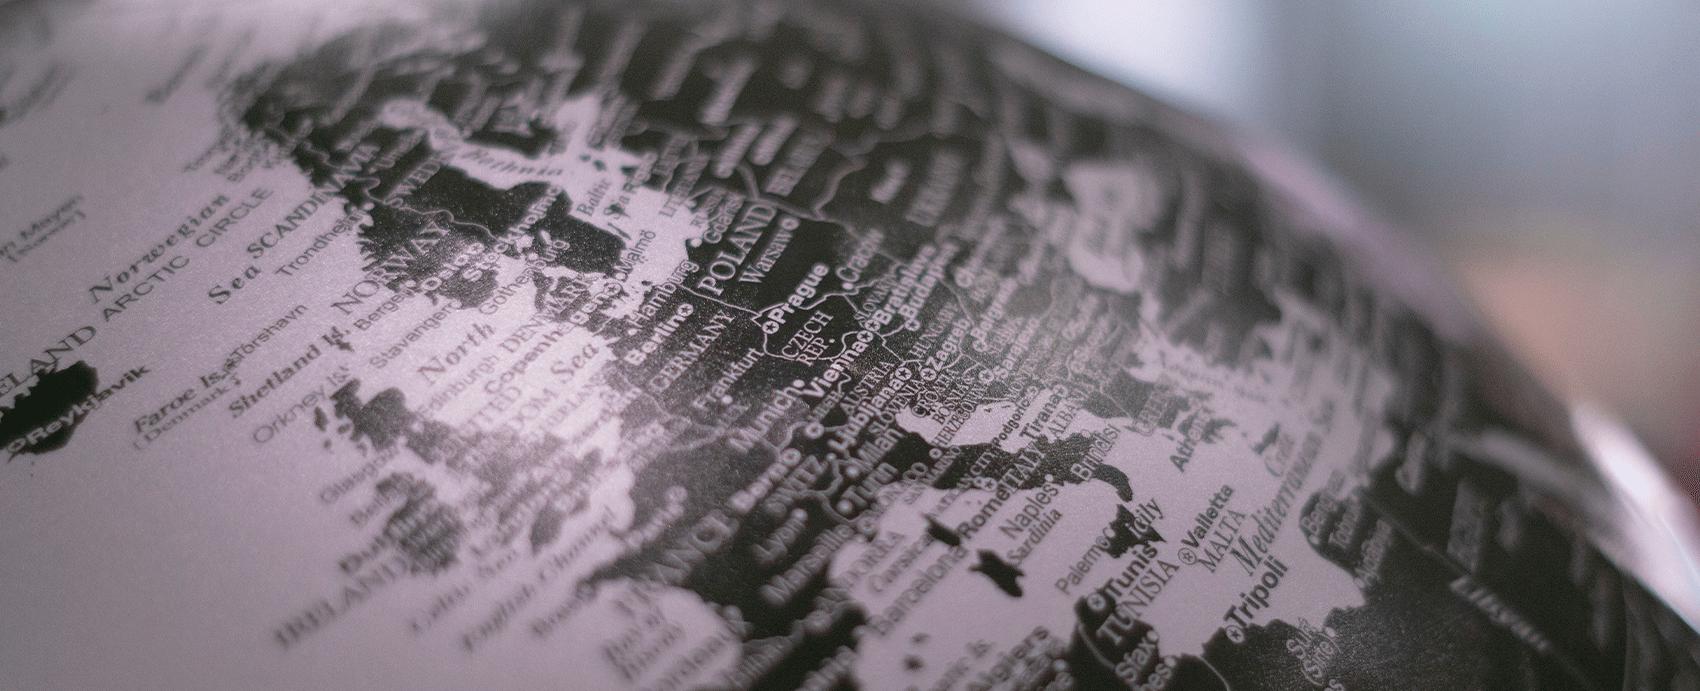 Product-localization-globe